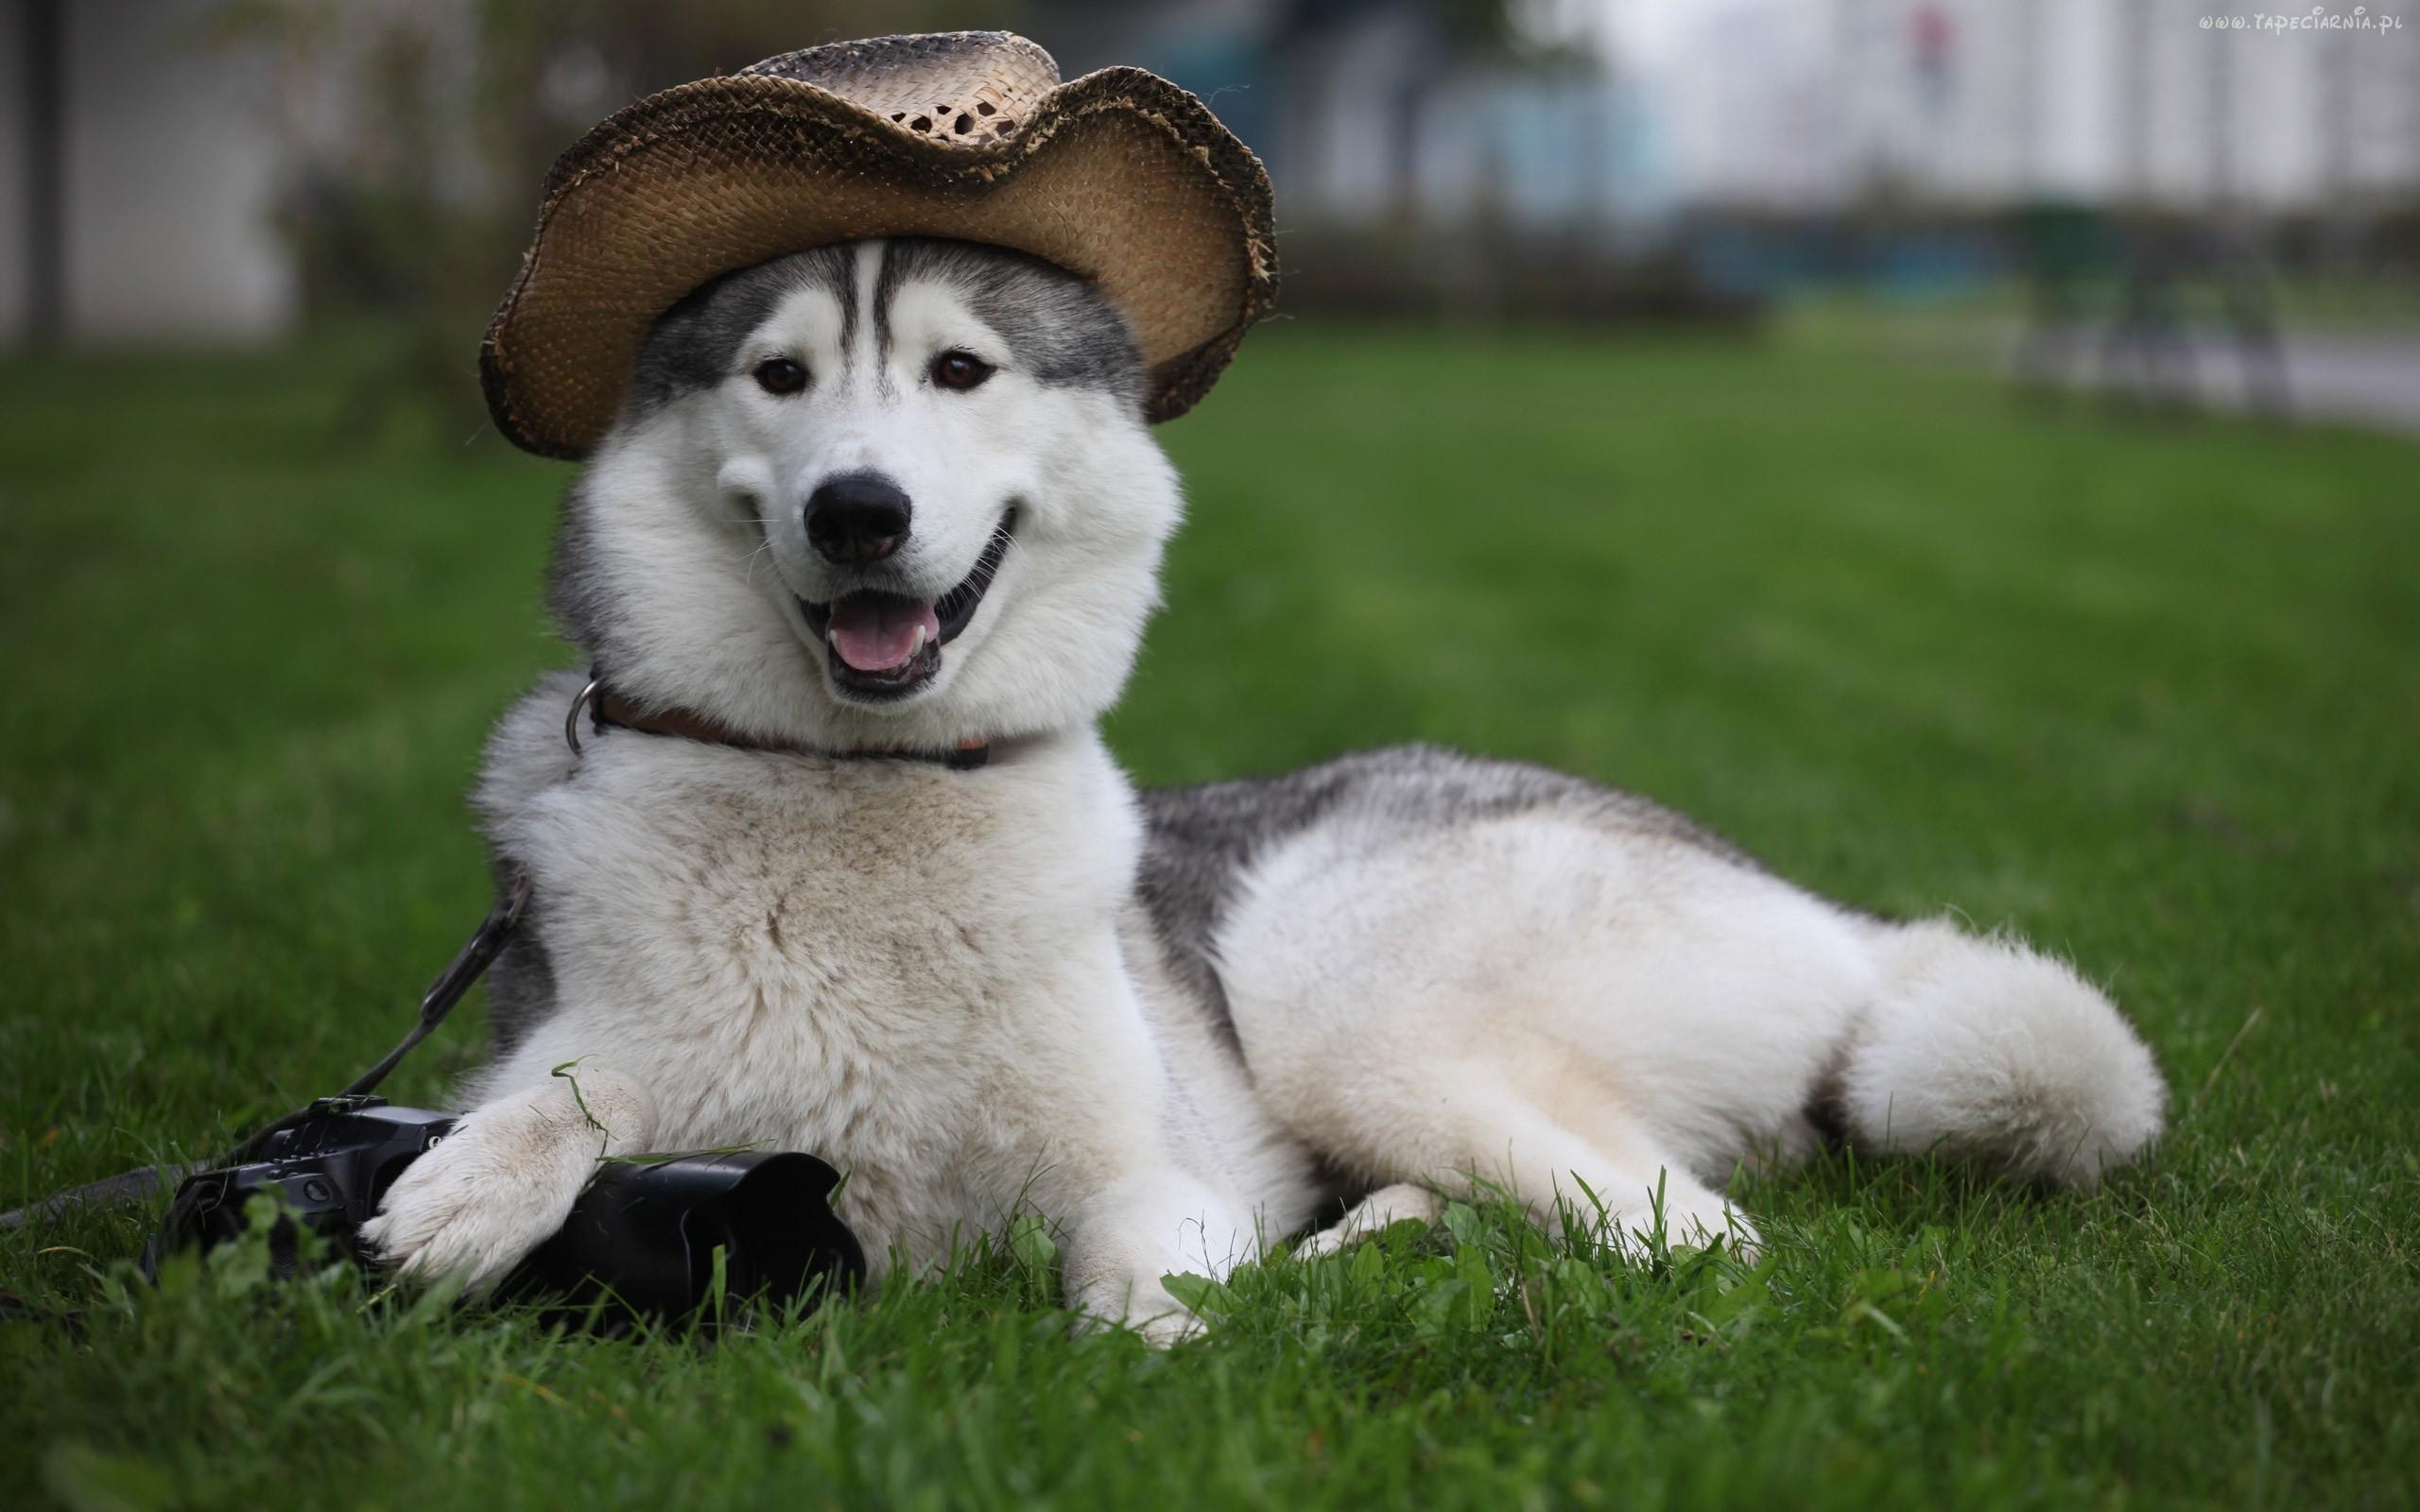 Siberian husky dog time (hora del perro husky siberiano)